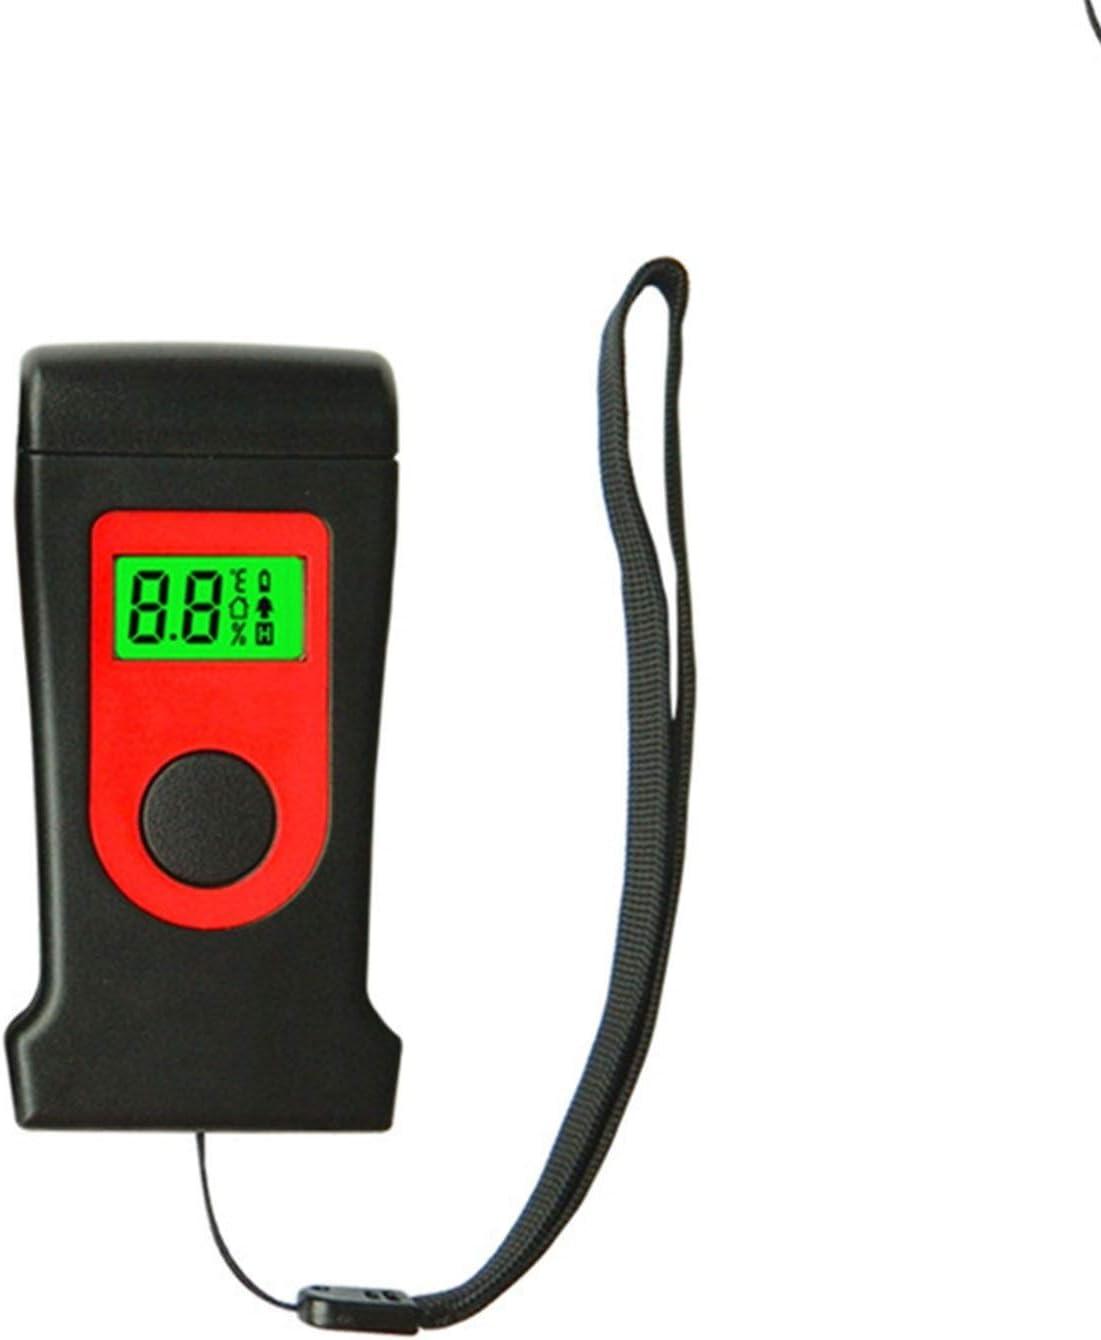 Wholesale L-SHISM Moisture Meter Detects MT250-6-60% Woo Pins San Francisco Mall Range Test 2